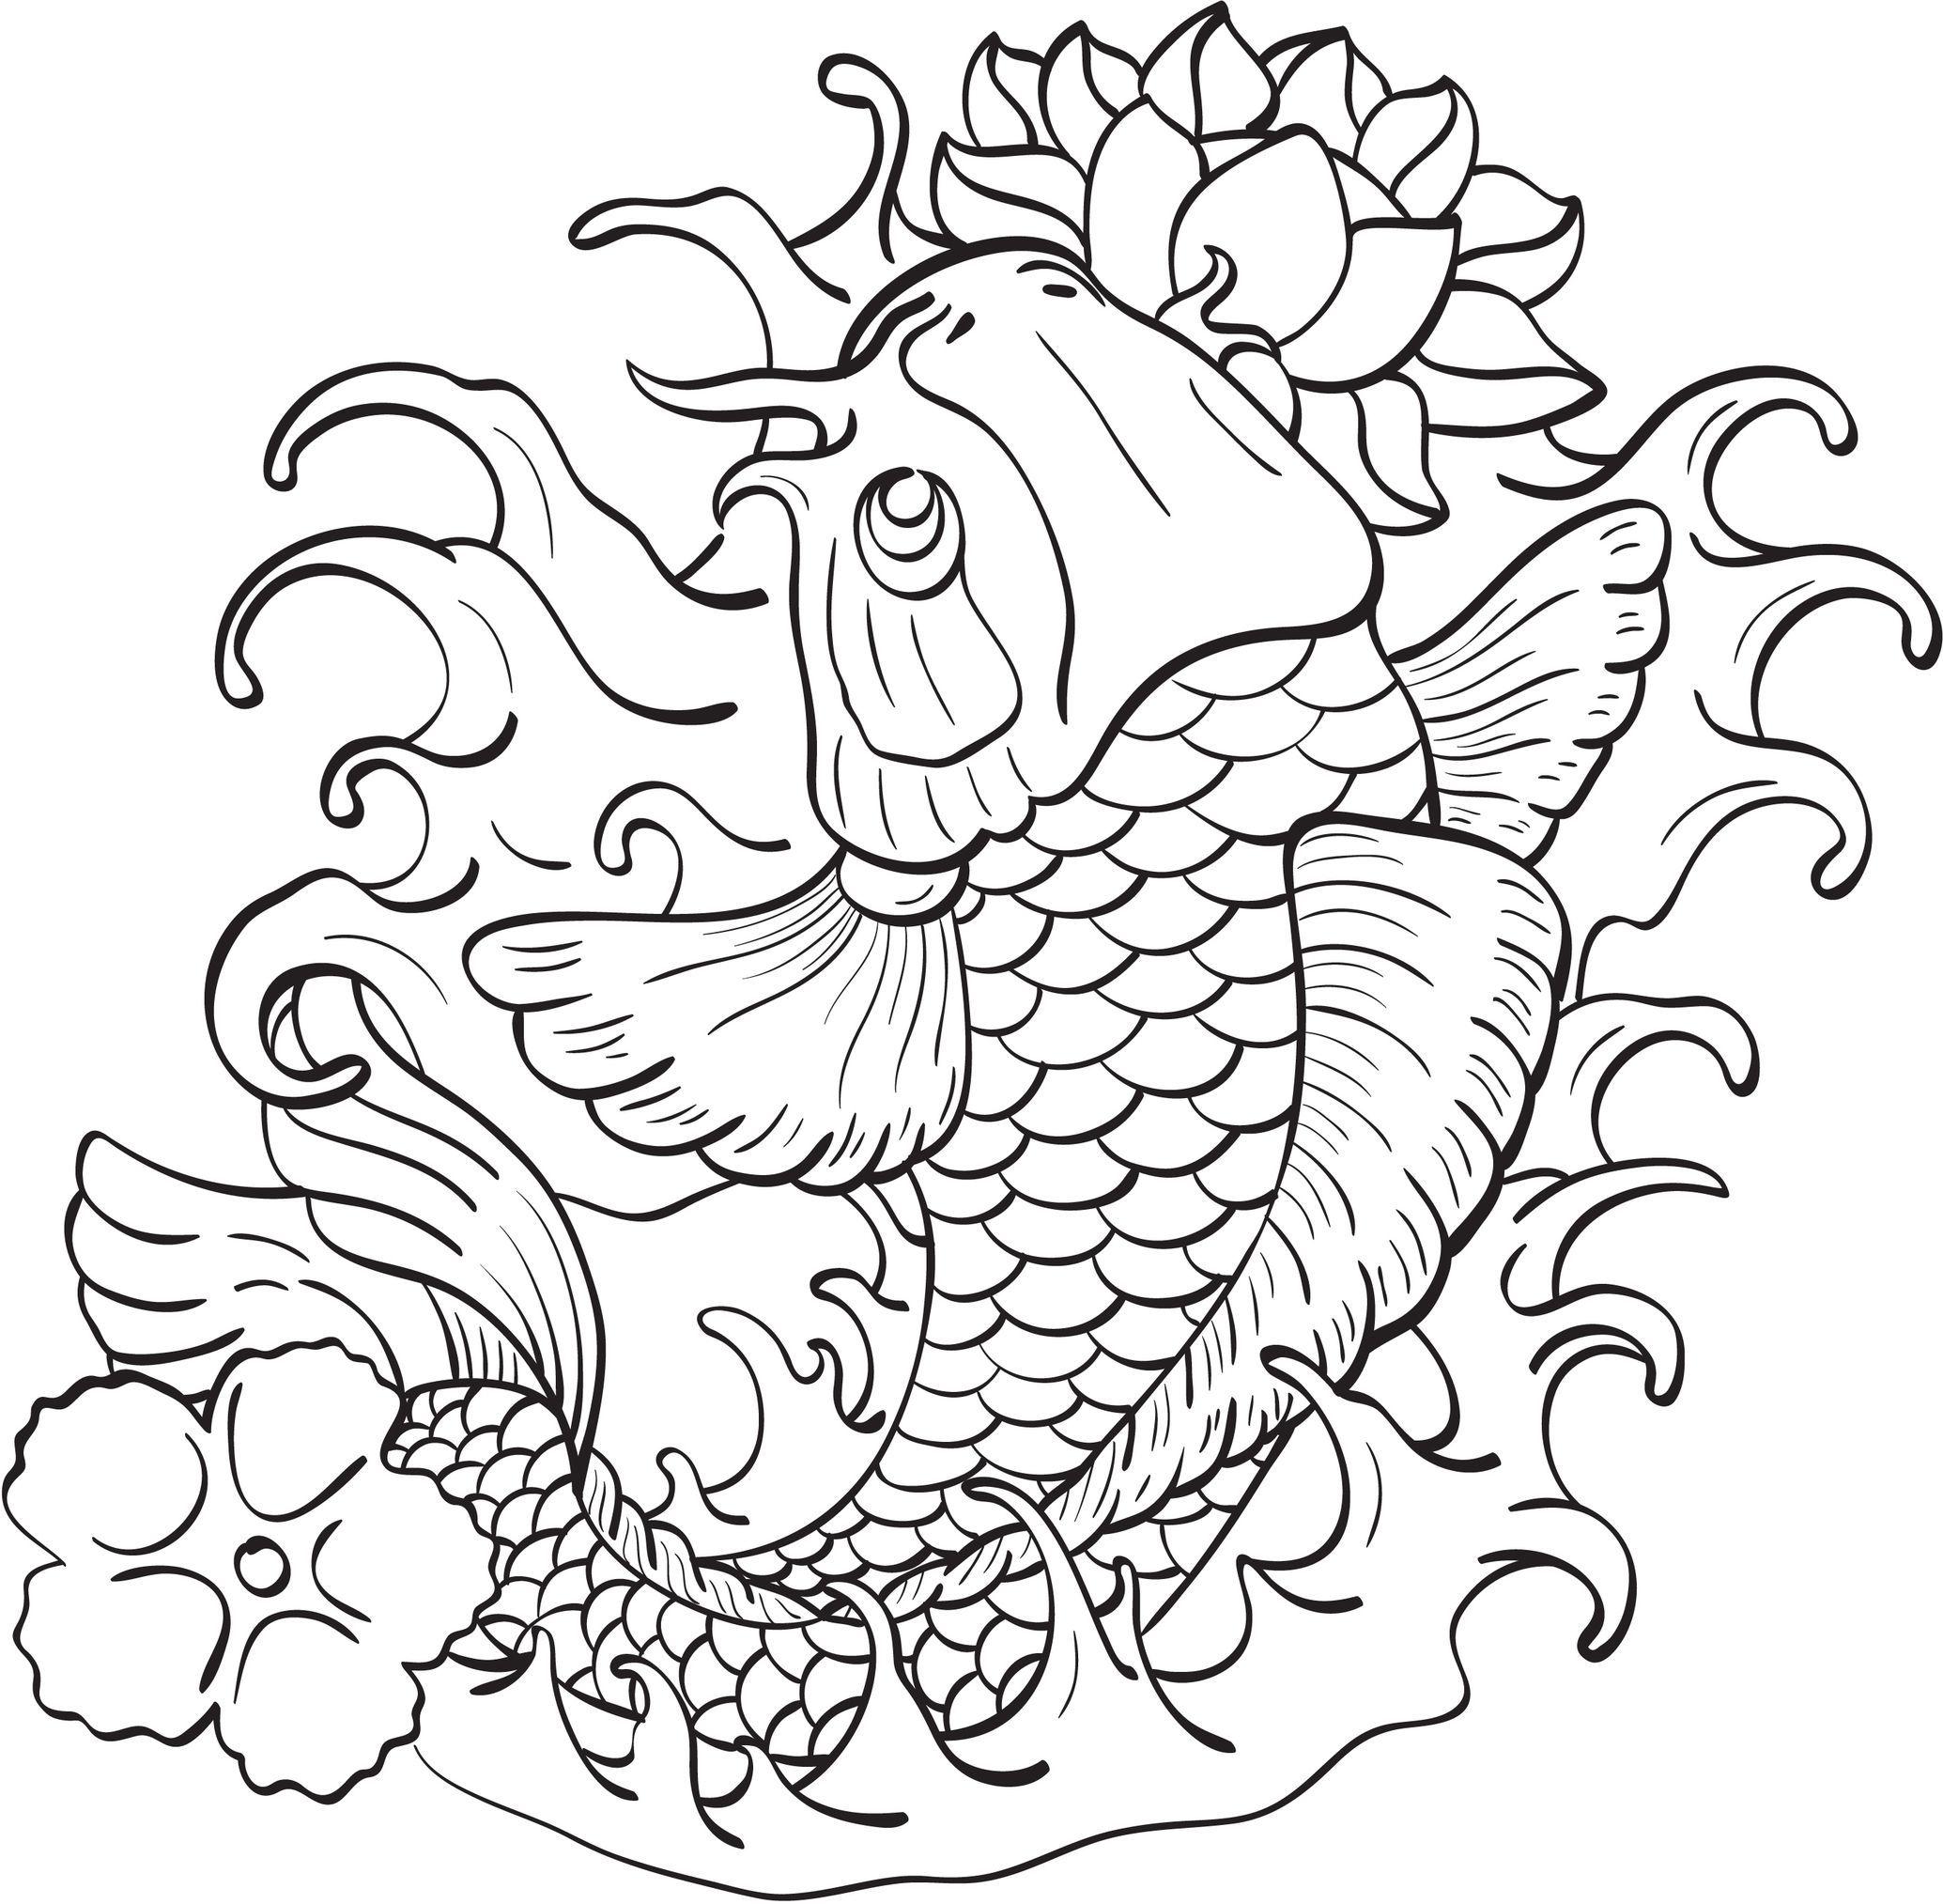 Coloriage de poisson japonnais seafcrystlballs pinterest royalty free koi fish art images and pictures izmirmasajfo Images